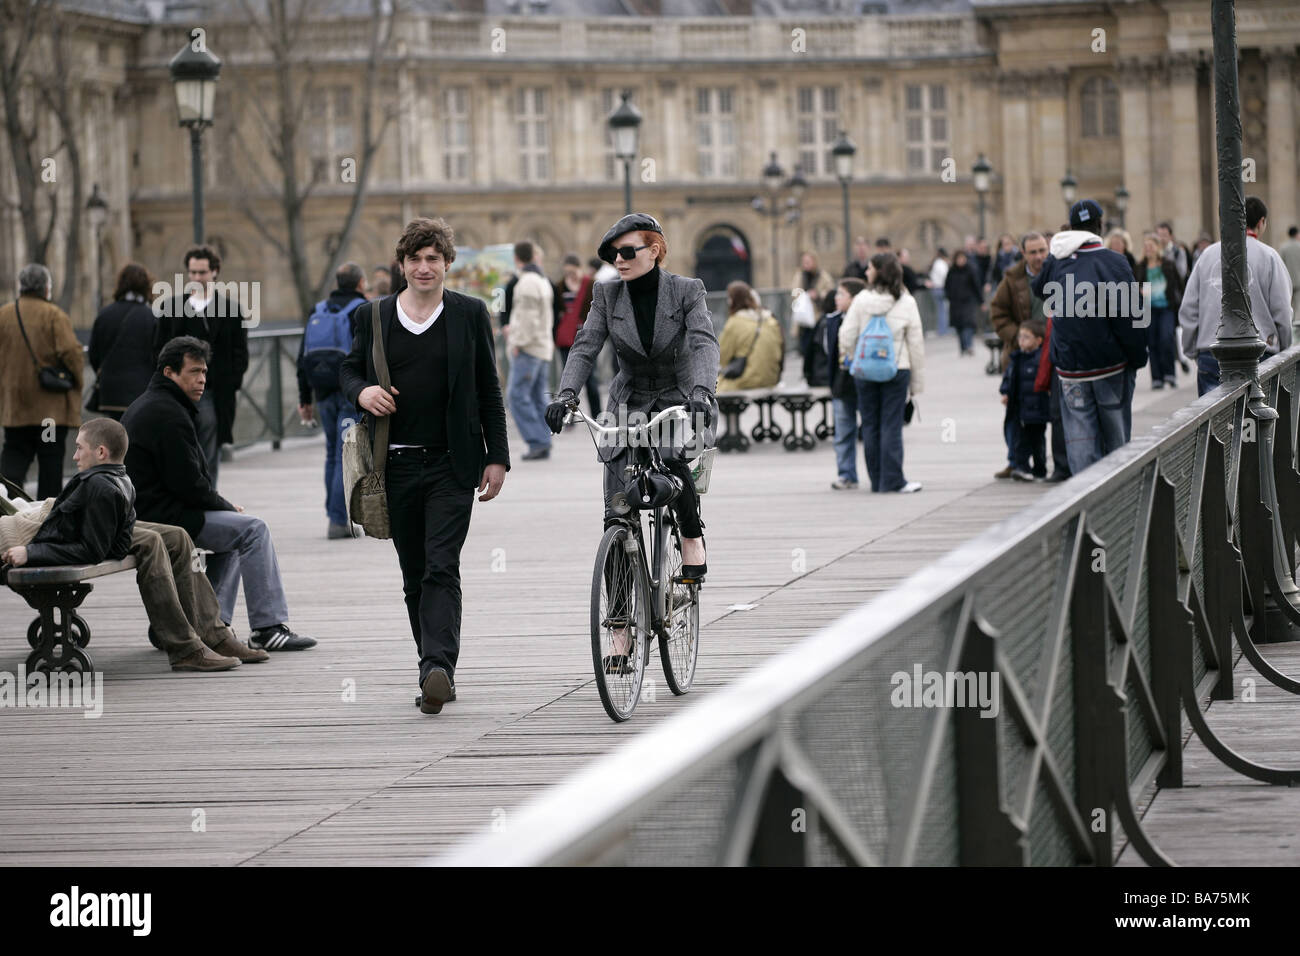 France Paris models Pont of the Art passers-by no release outside bridge Europe France pedestrians capital autumn - Stock Image